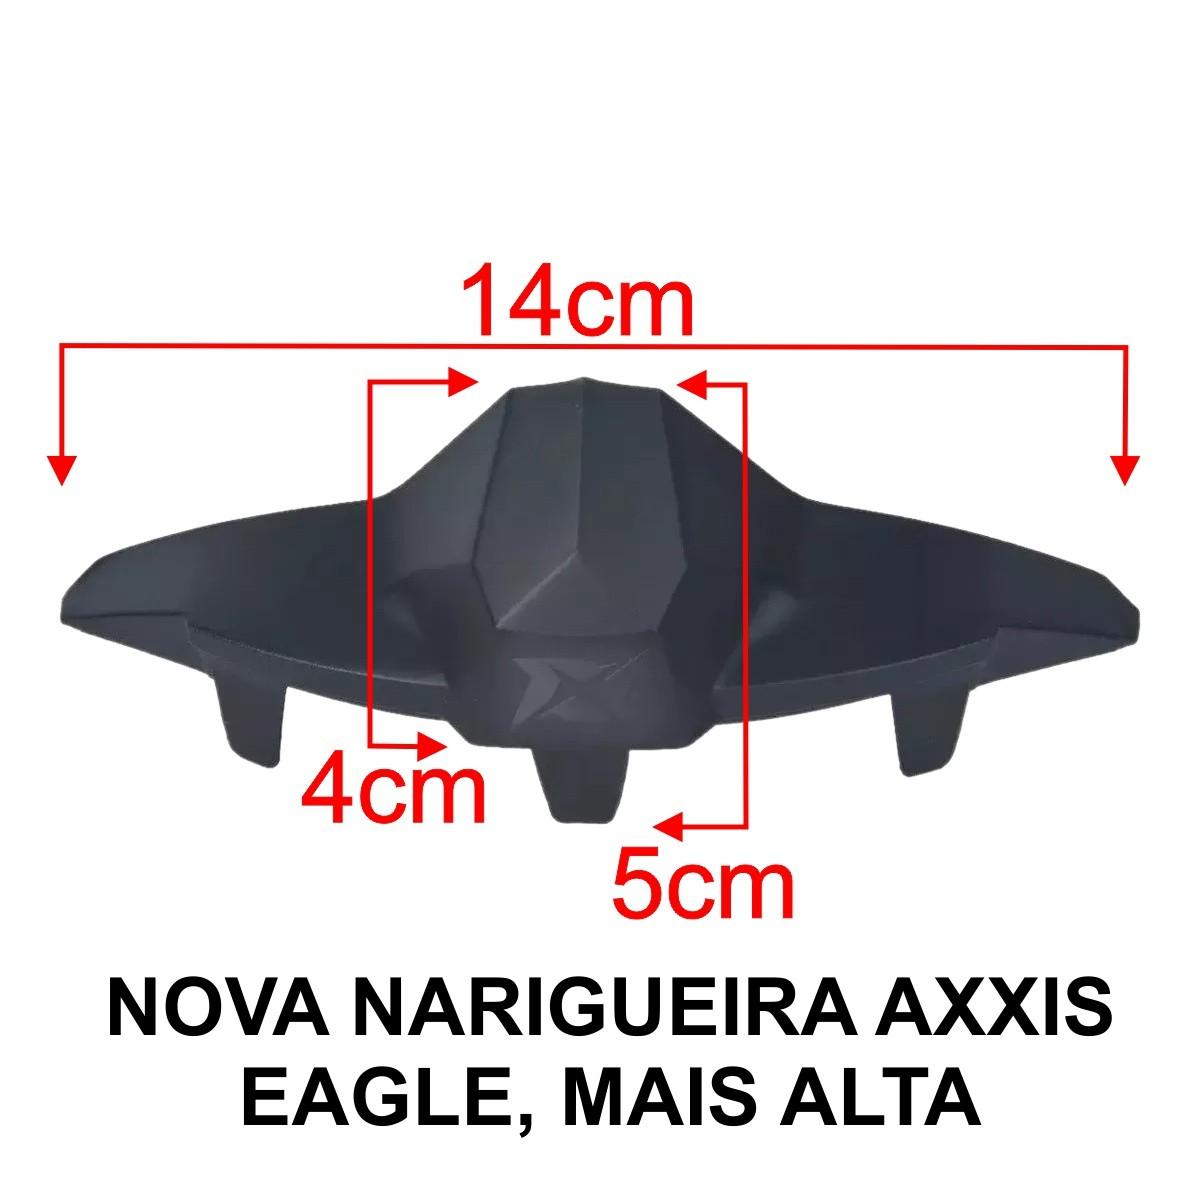 KIT VISEIRA AXXIS EAGLE SILVER PRATA V18 + NARIGUEIRA NEW ALTA